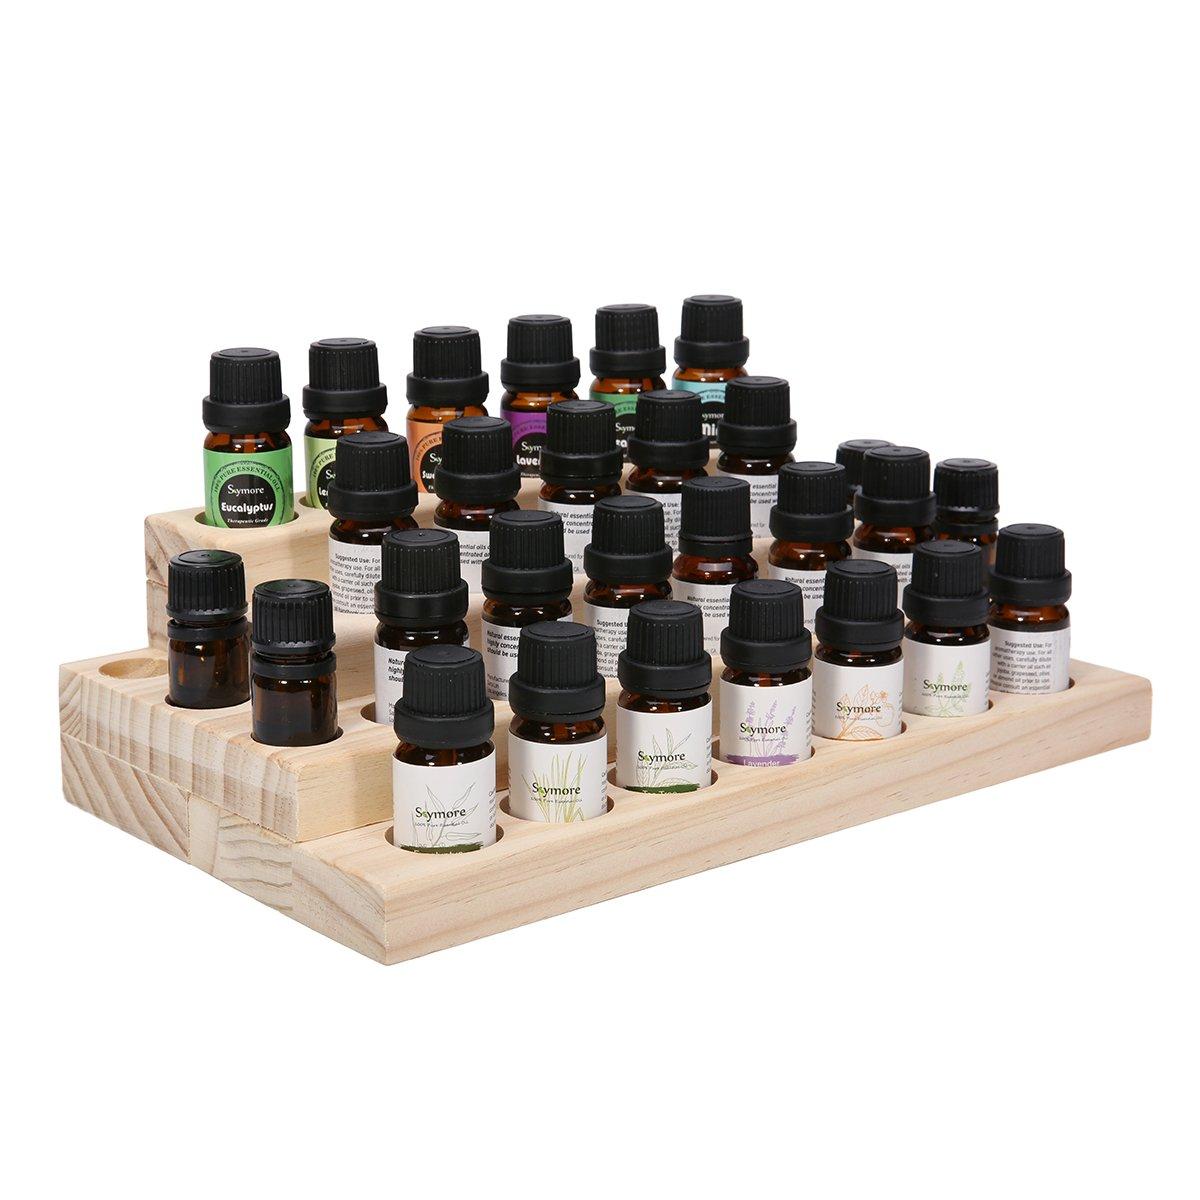 skymore 30 flaschen st nder display aus holz. Black Bedroom Furniture Sets. Home Design Ideas